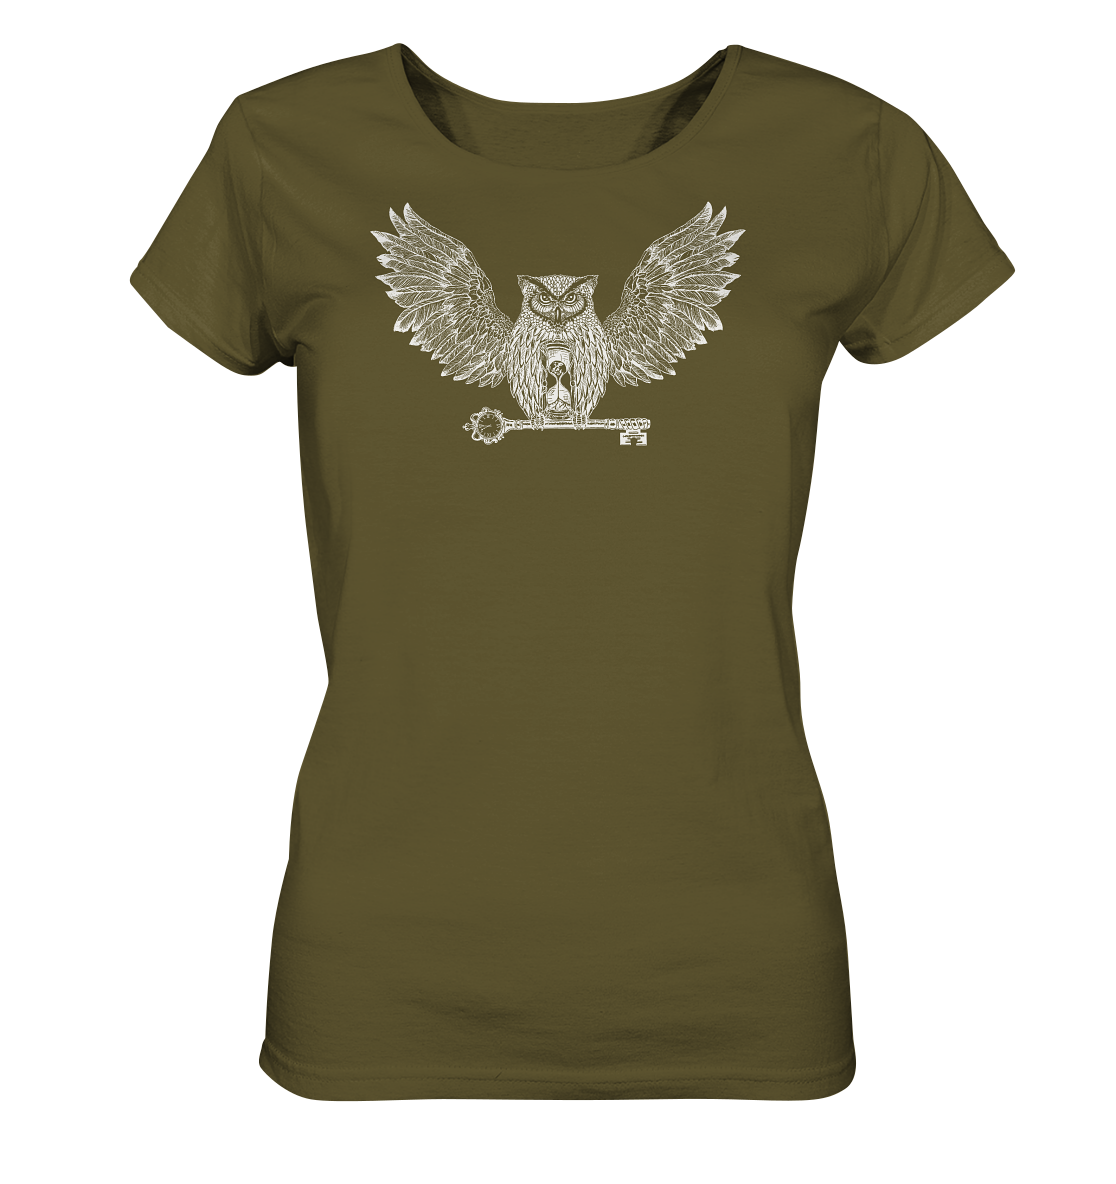 front-ladies-organic-shirt-5e5530-1116x-4.png